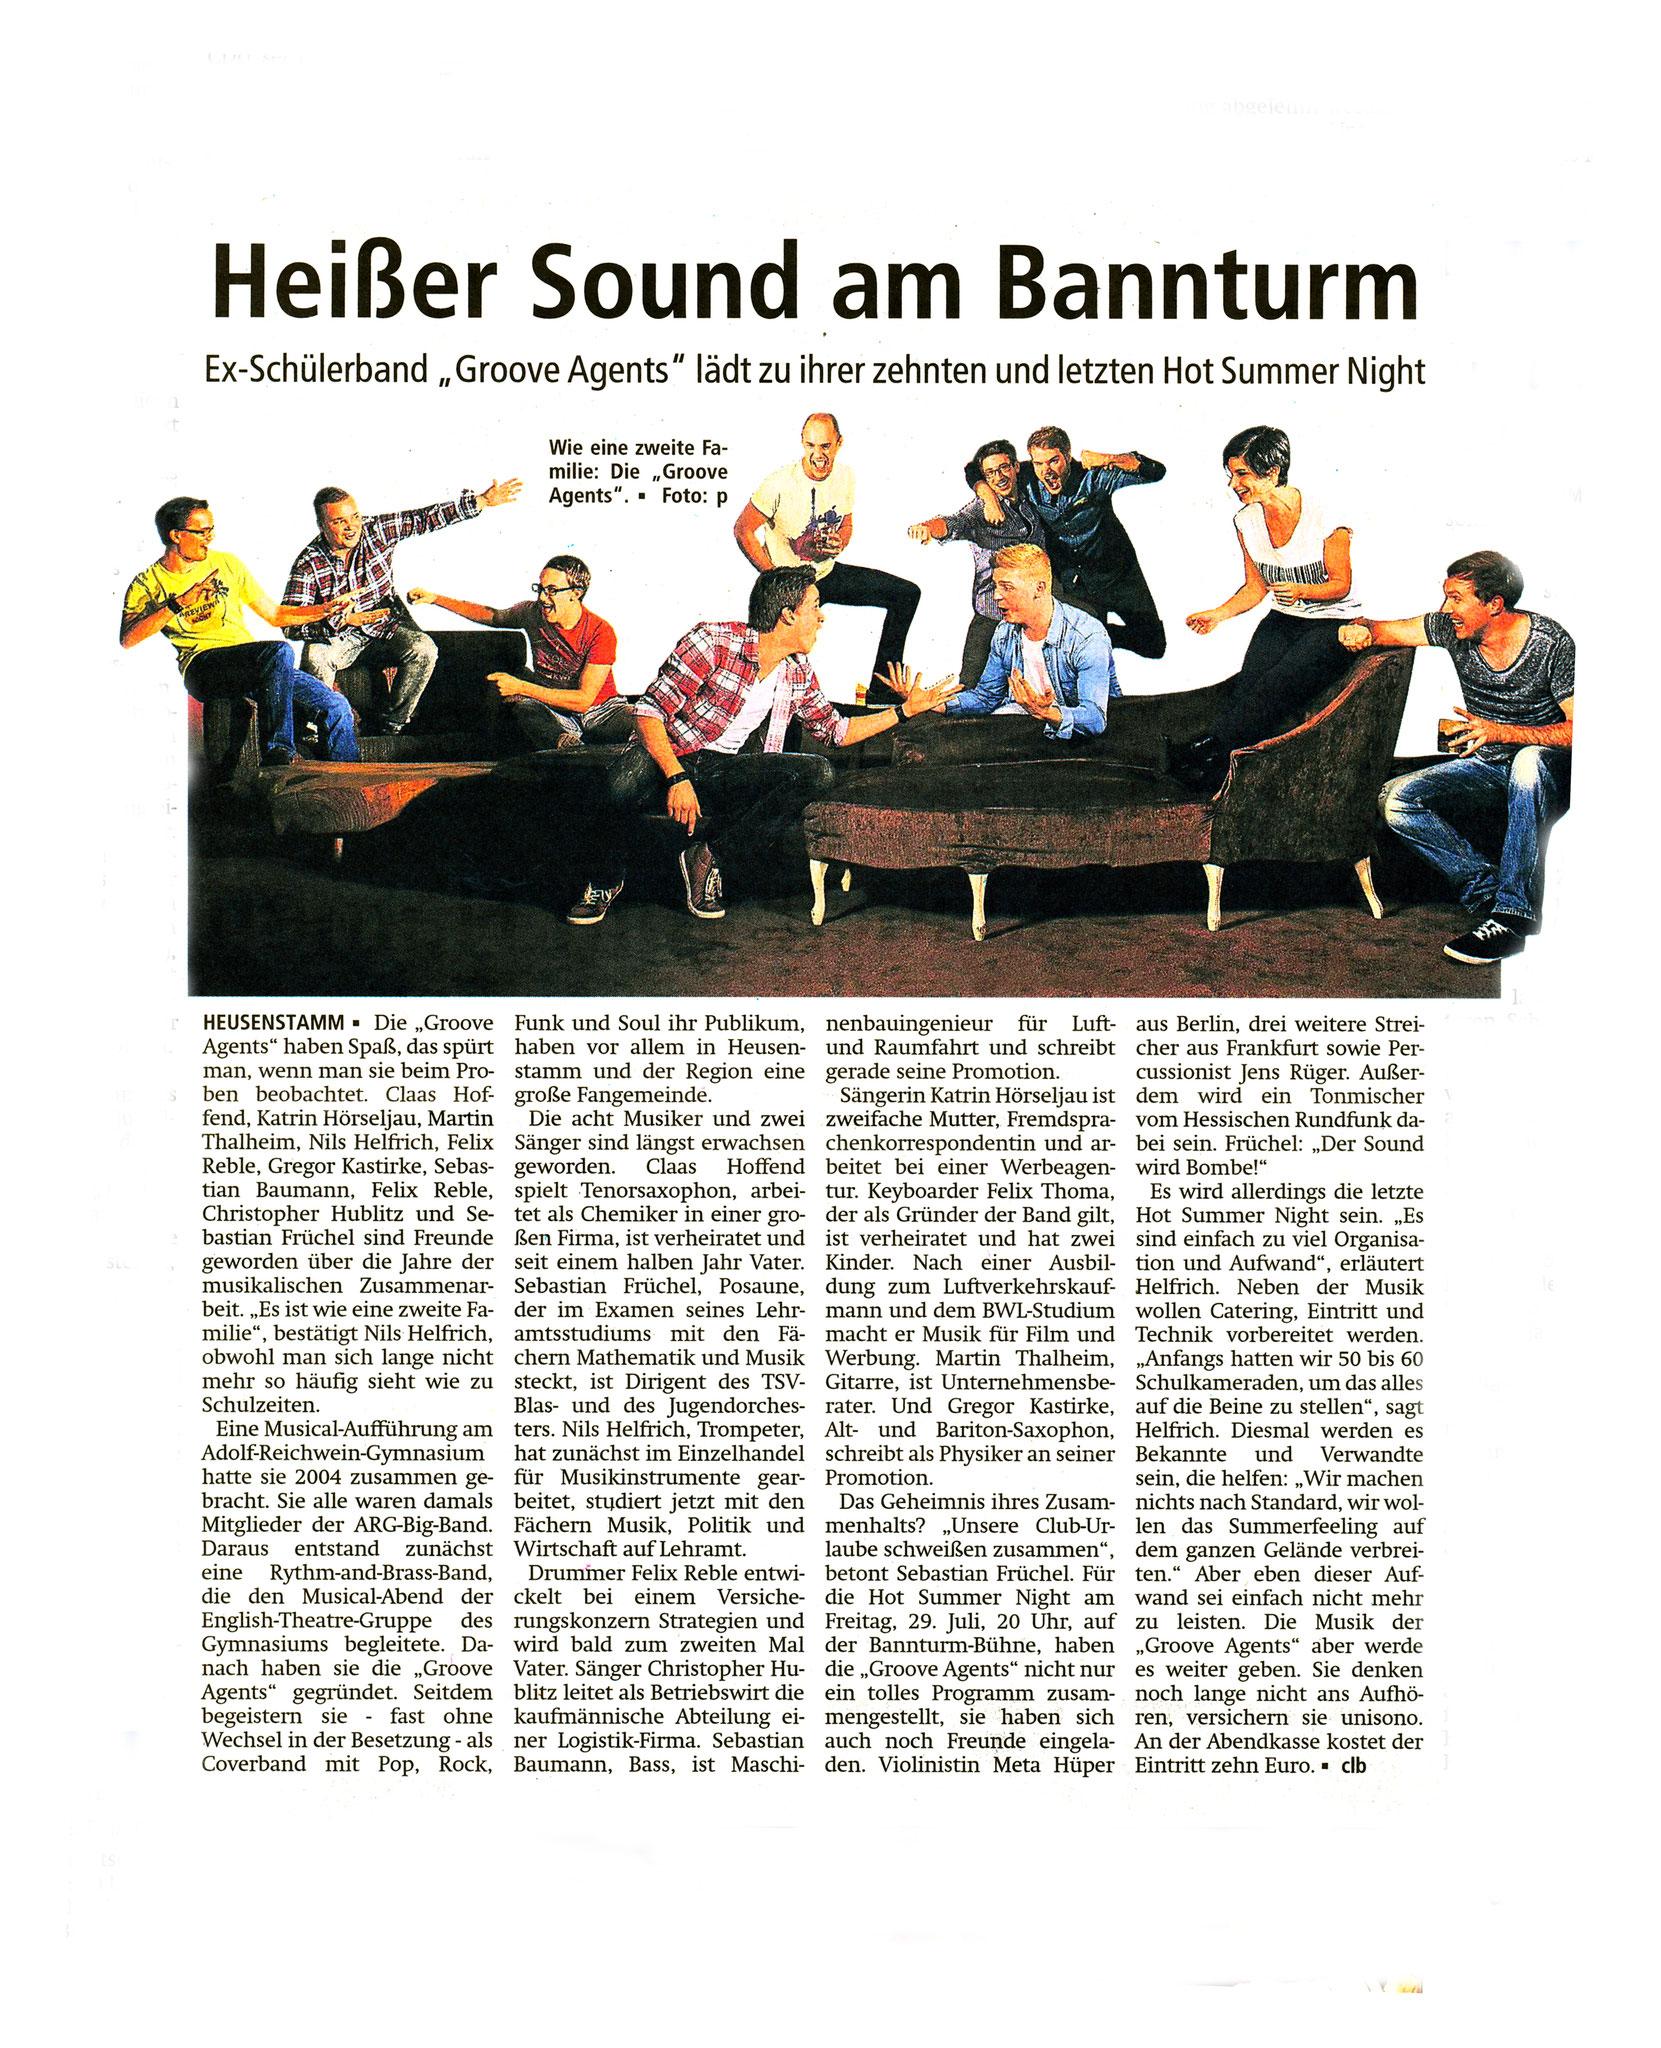 Offenbach Post, 23. Juli 2016